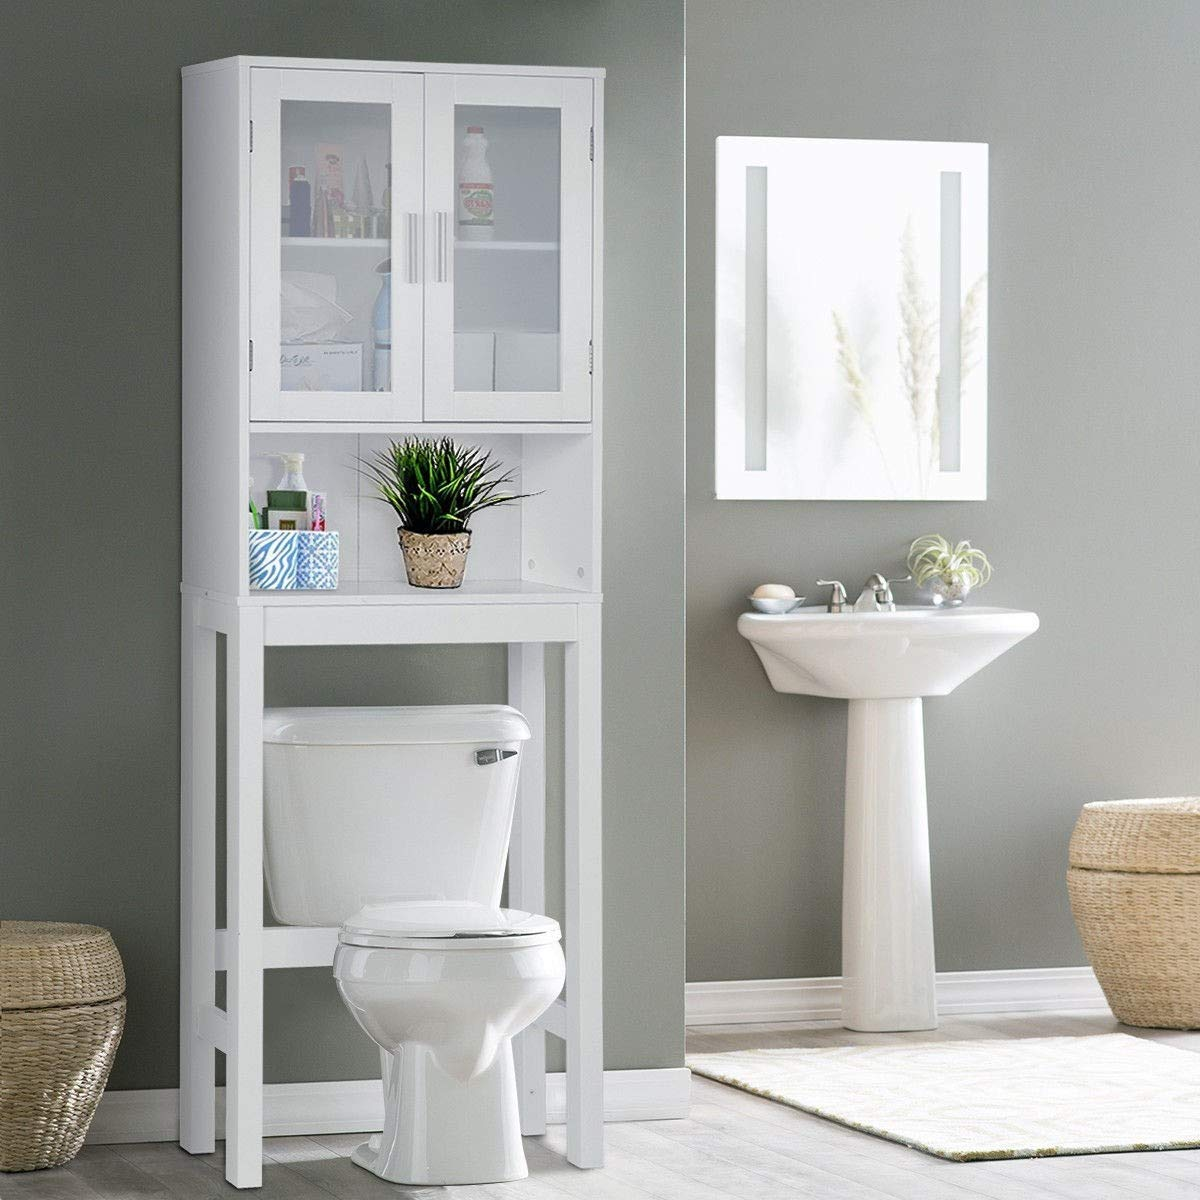 BestComfort Wooden Over The Toilet Cabinet Storage, Bathroom Organizer Over Toilet Storage, Above The Toilet Space Saver Cabinet by BestComfort